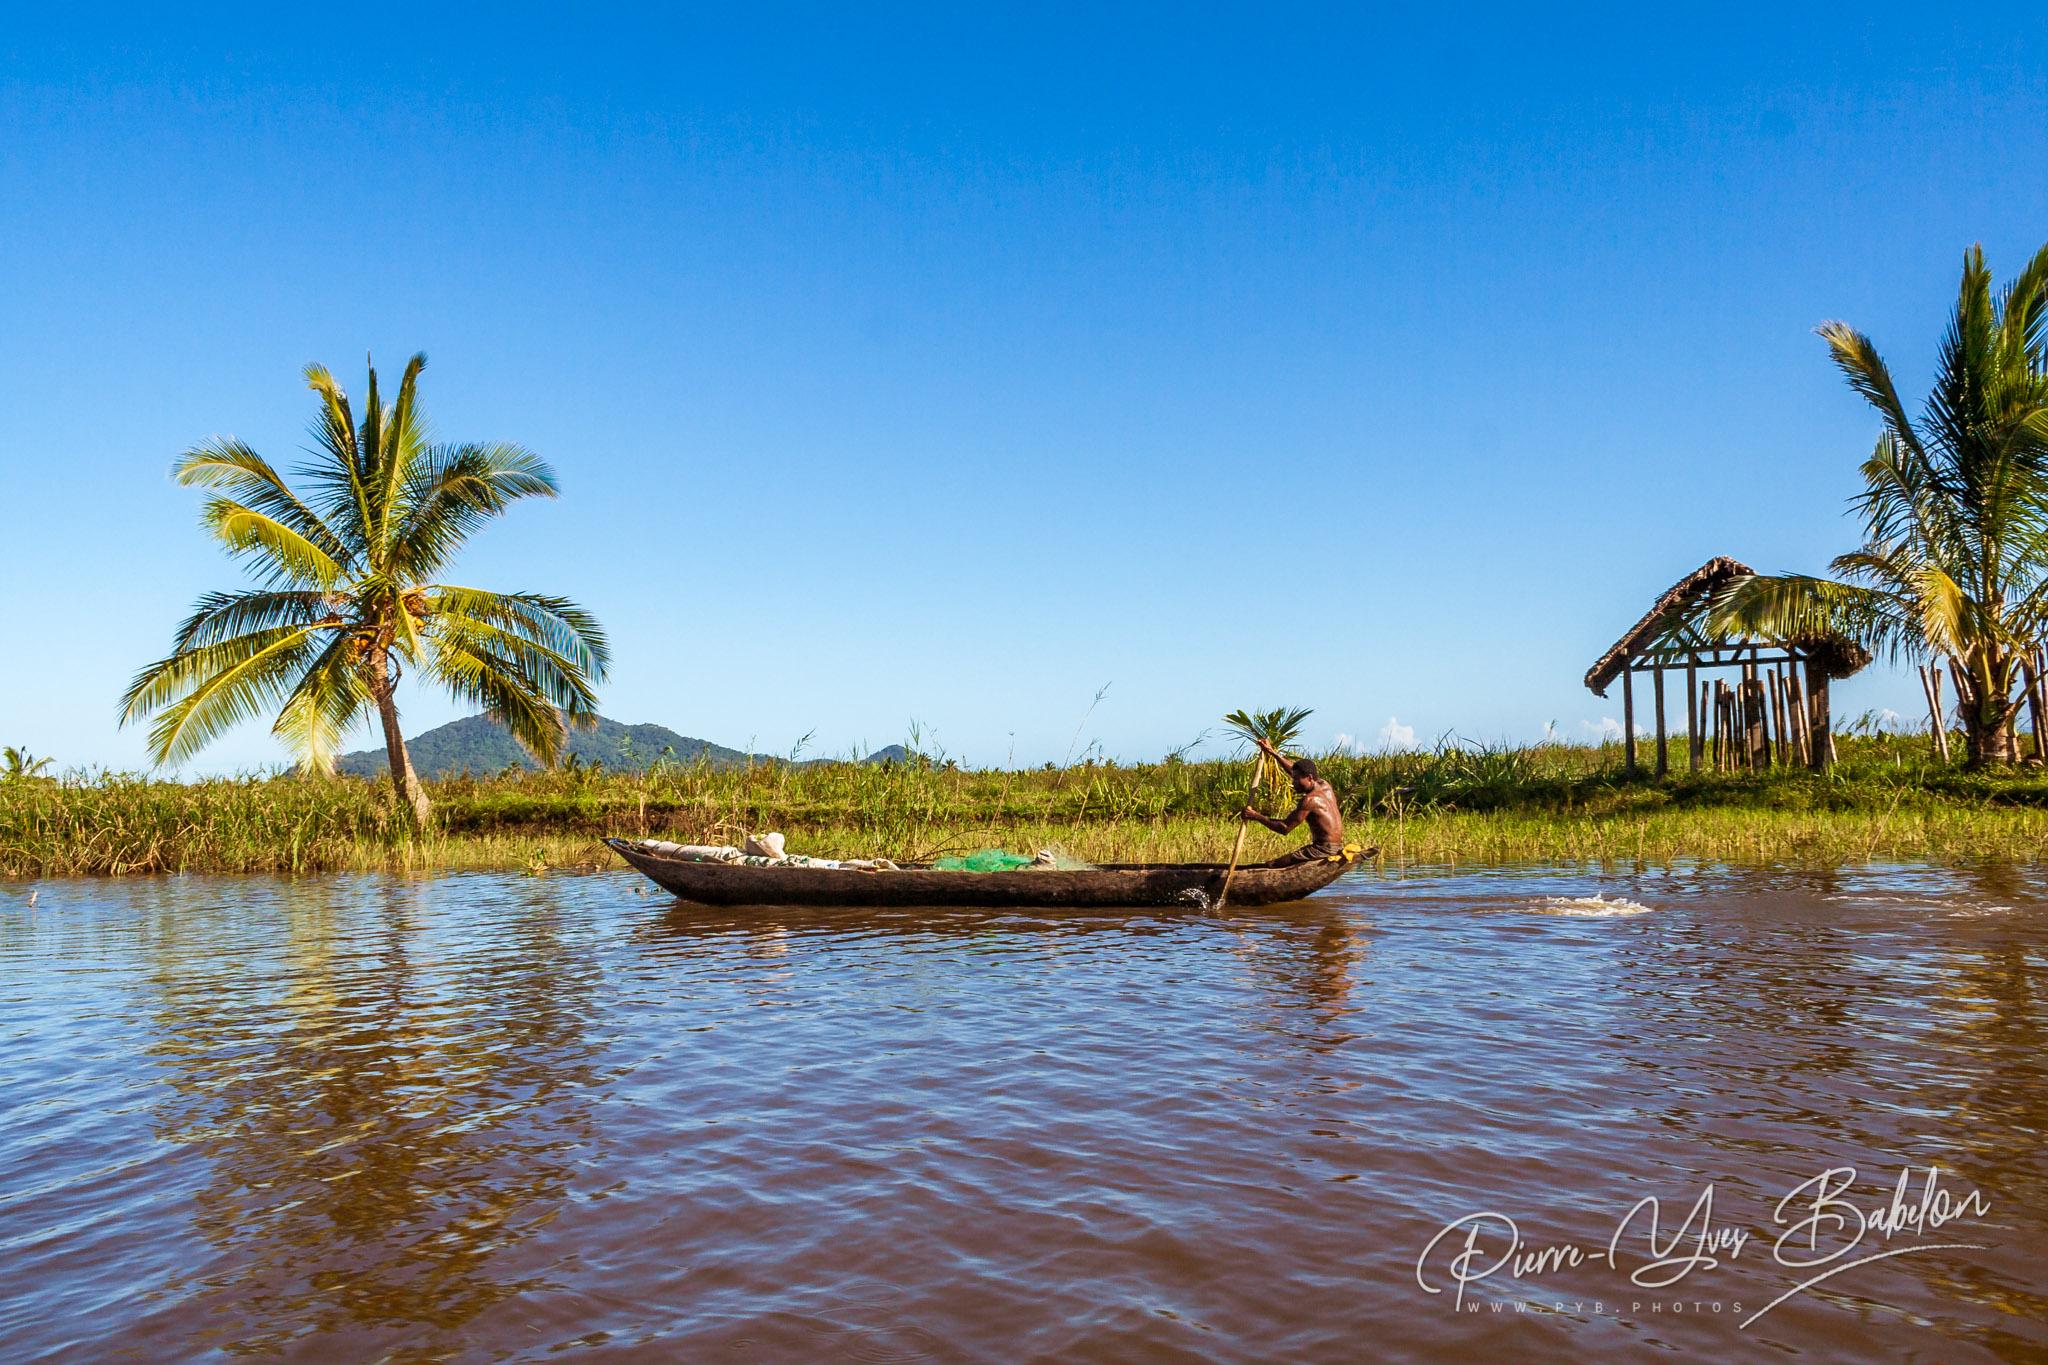 Dugout canoe driver